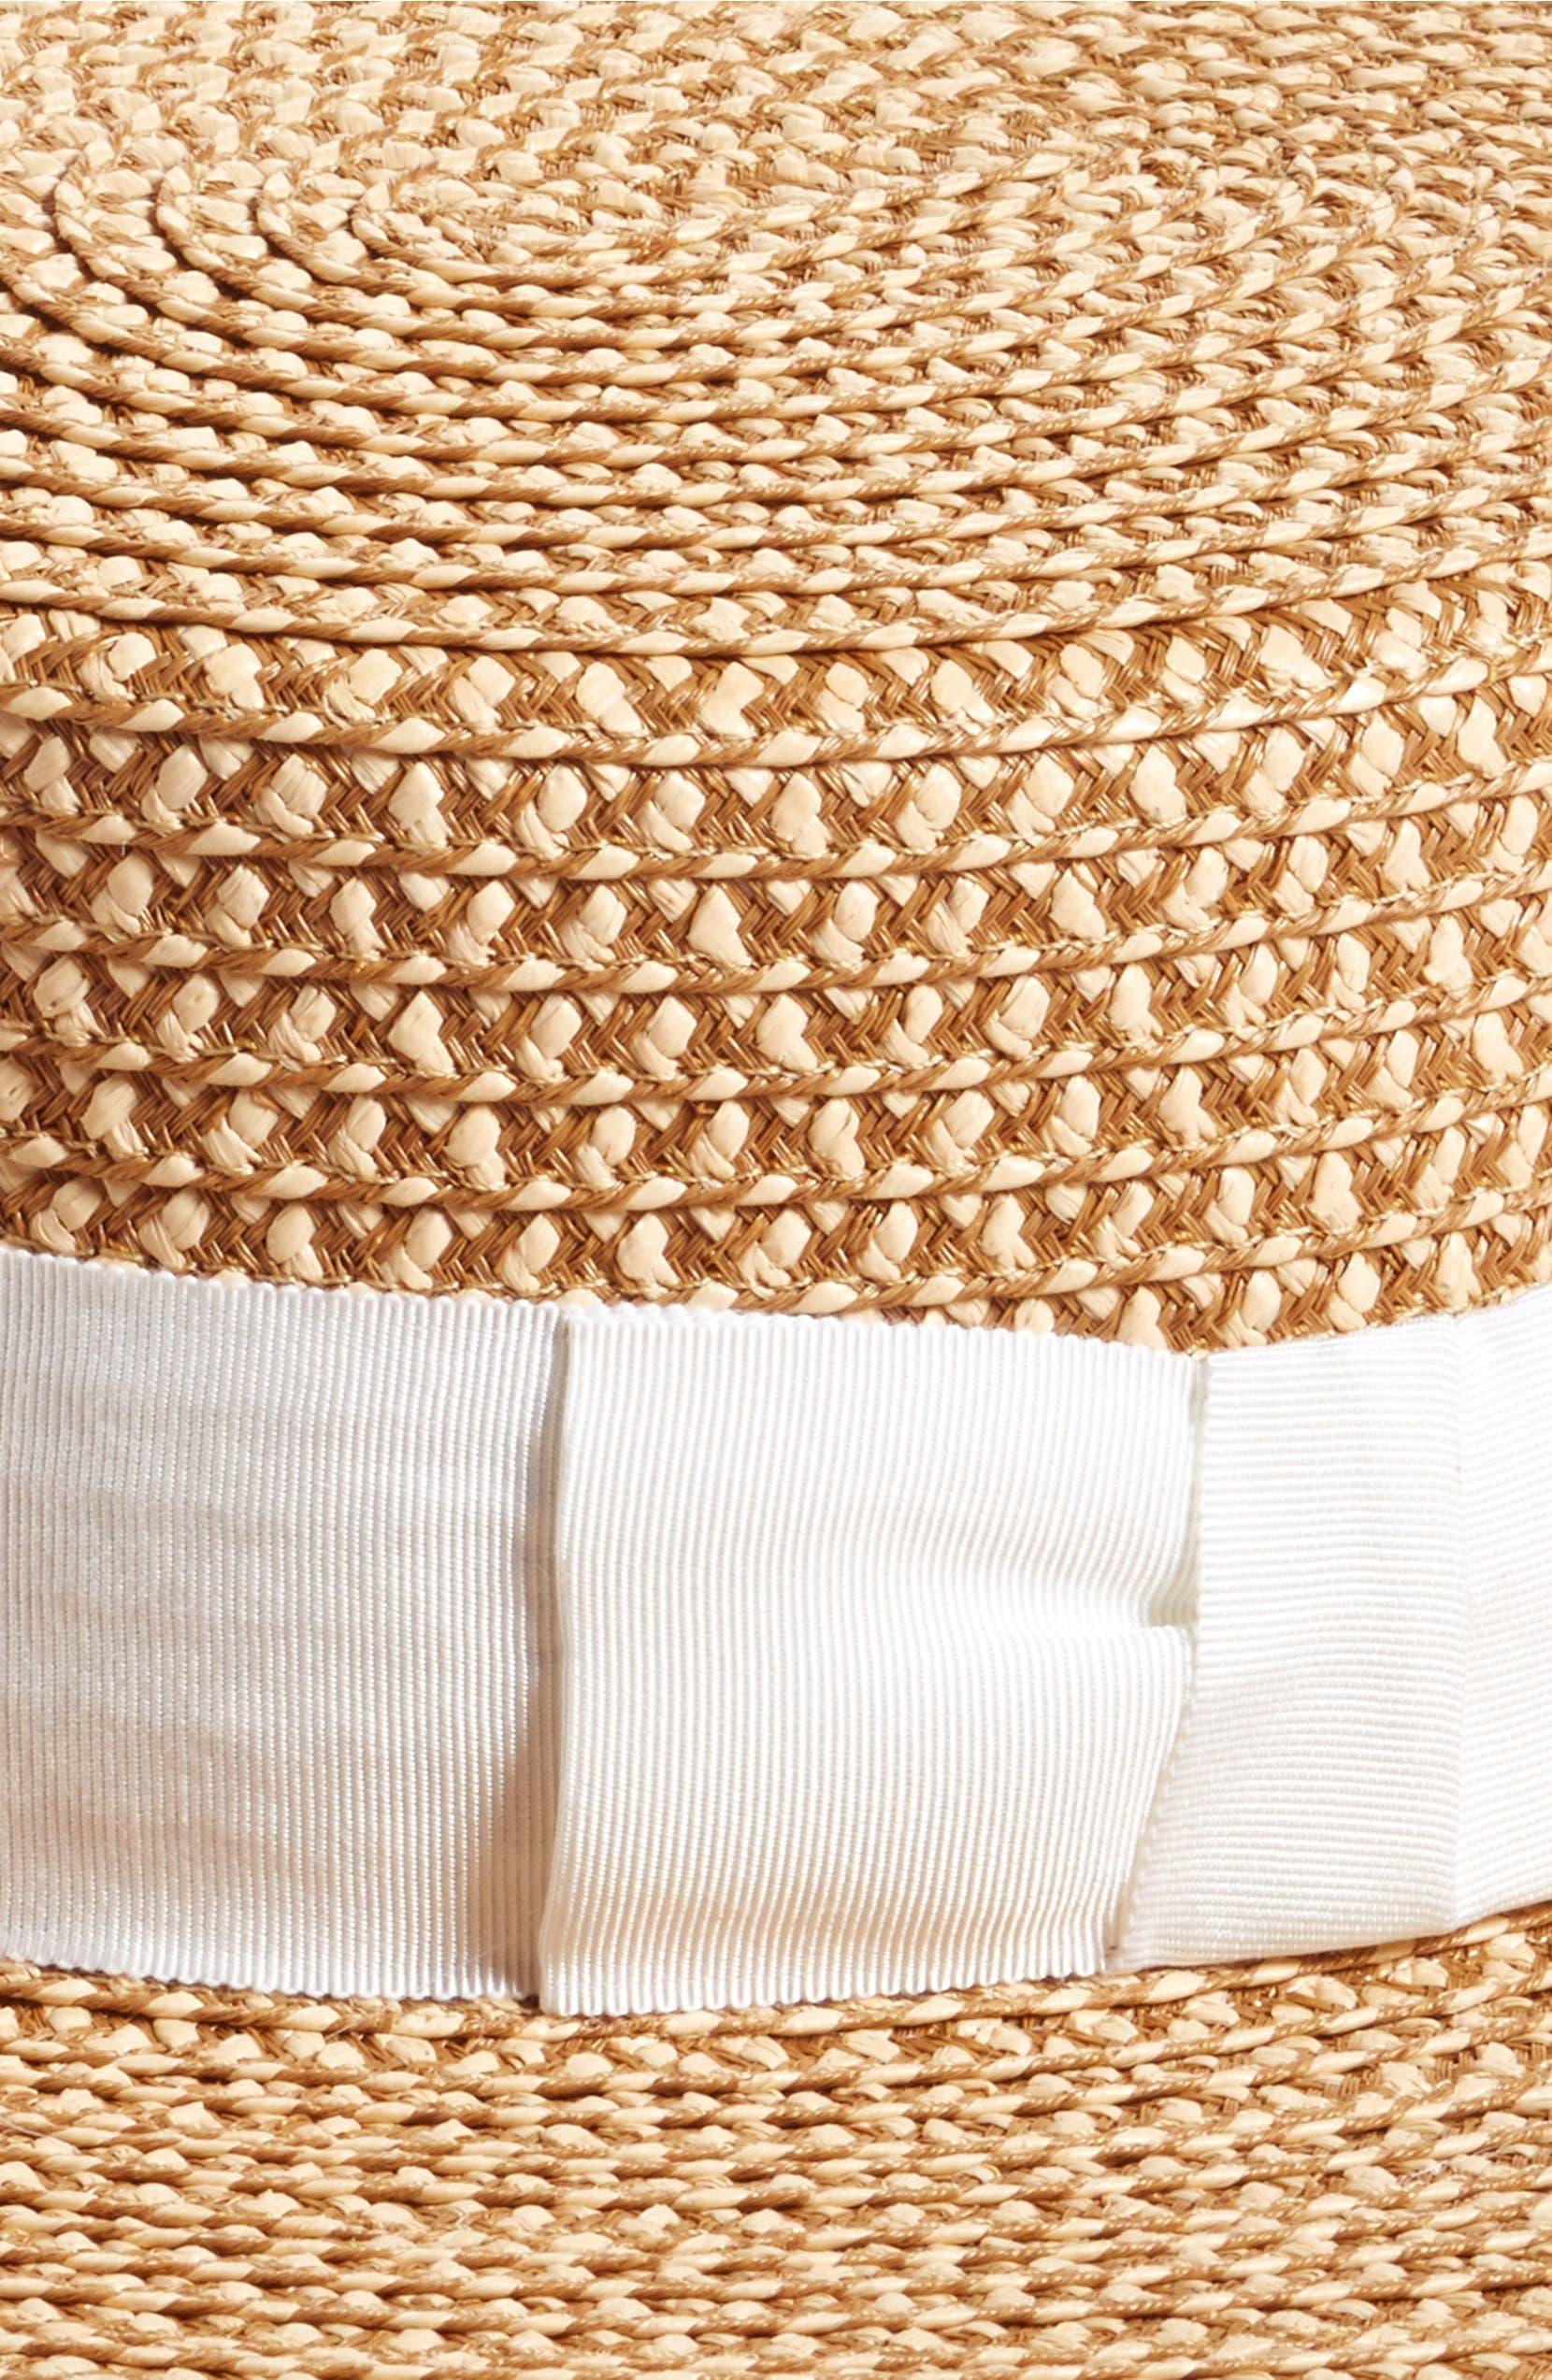 44fba392e5f84 Eric Javits  Gondolier  Boater Hat